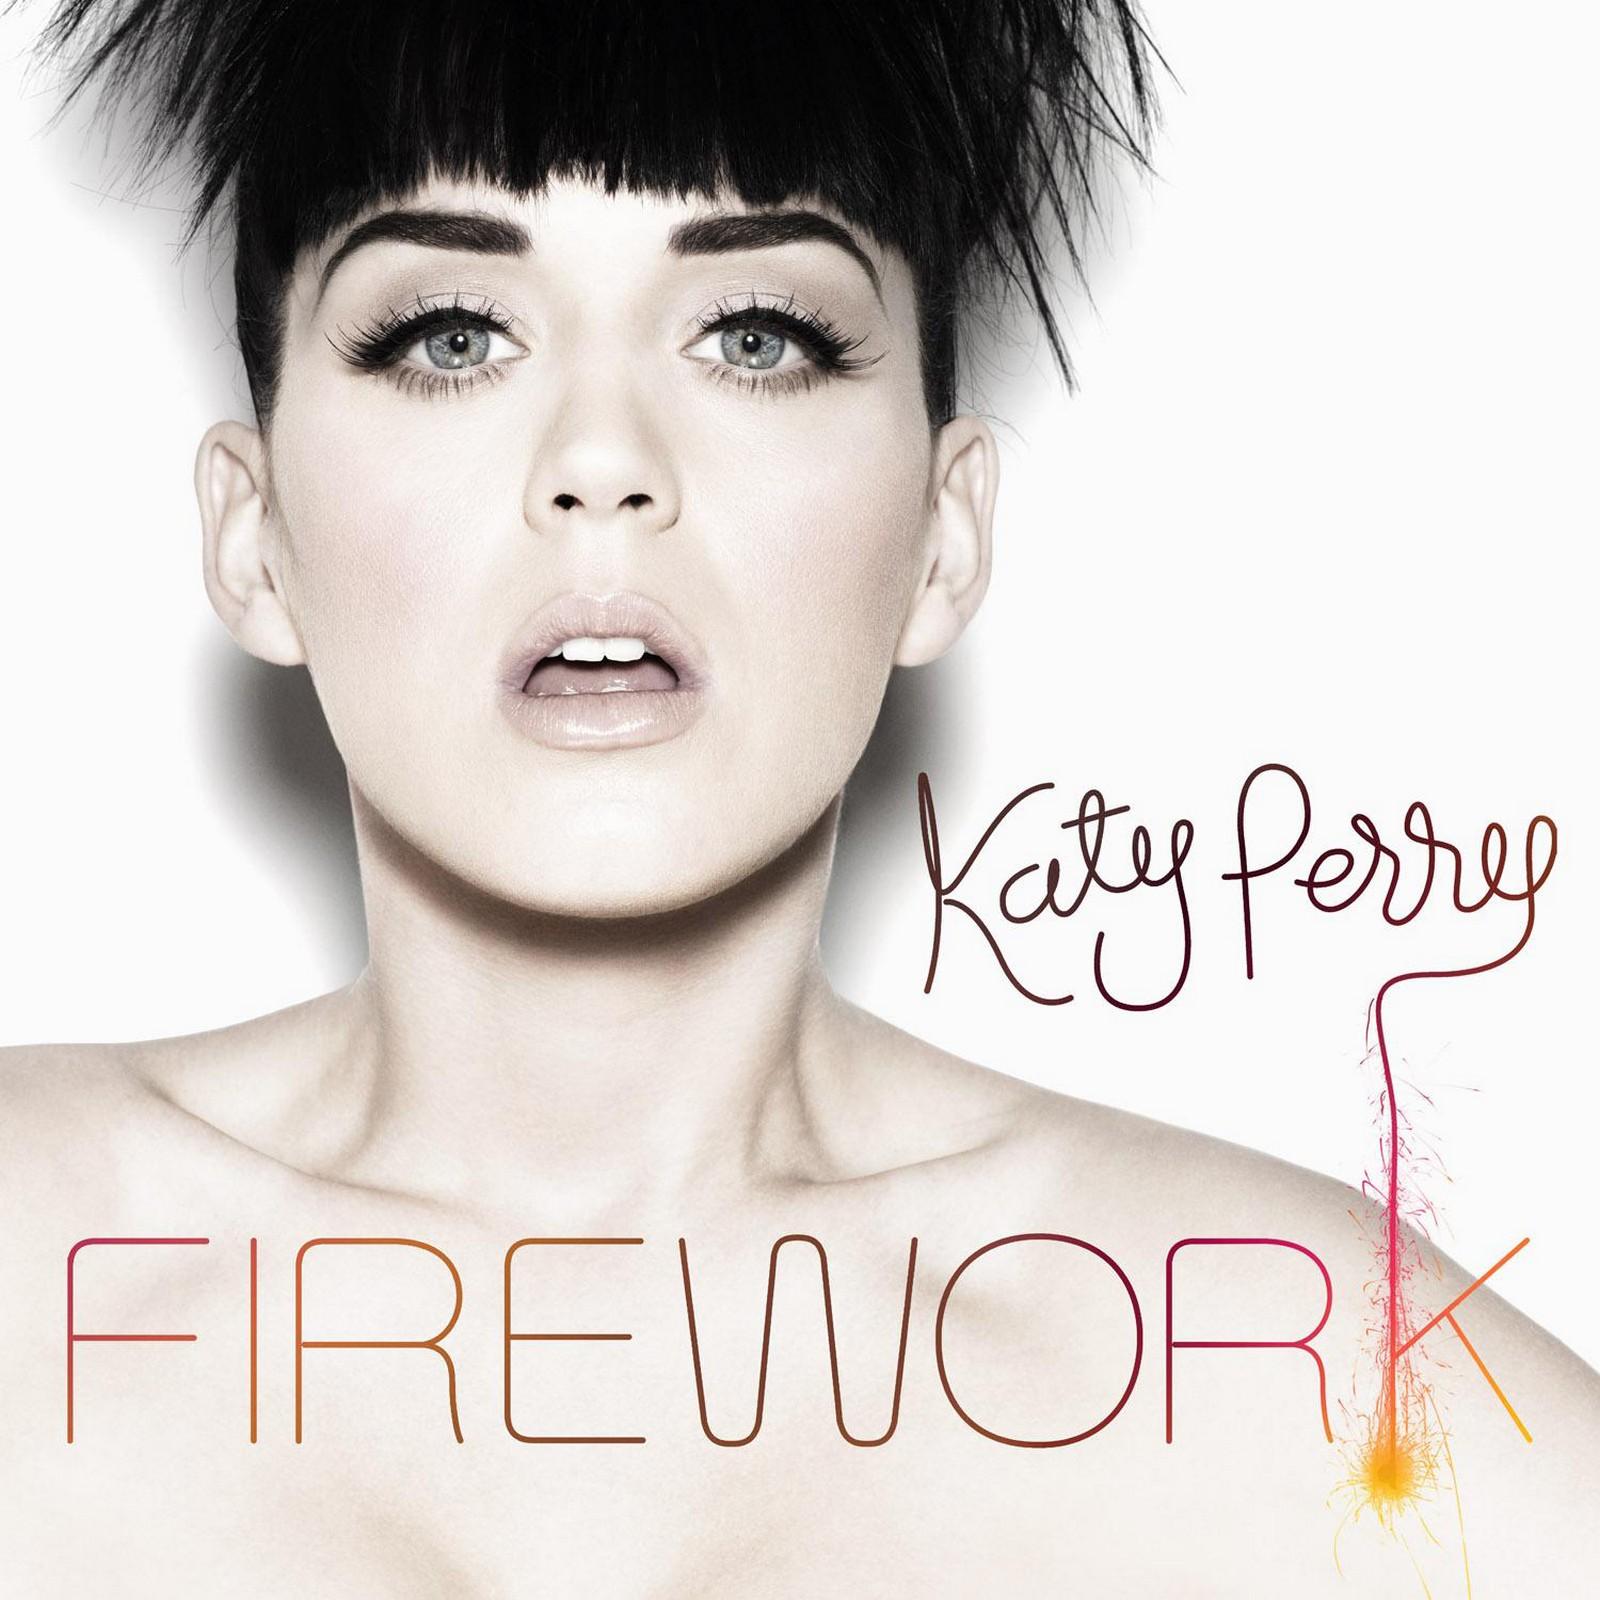 katy perry songs torrent